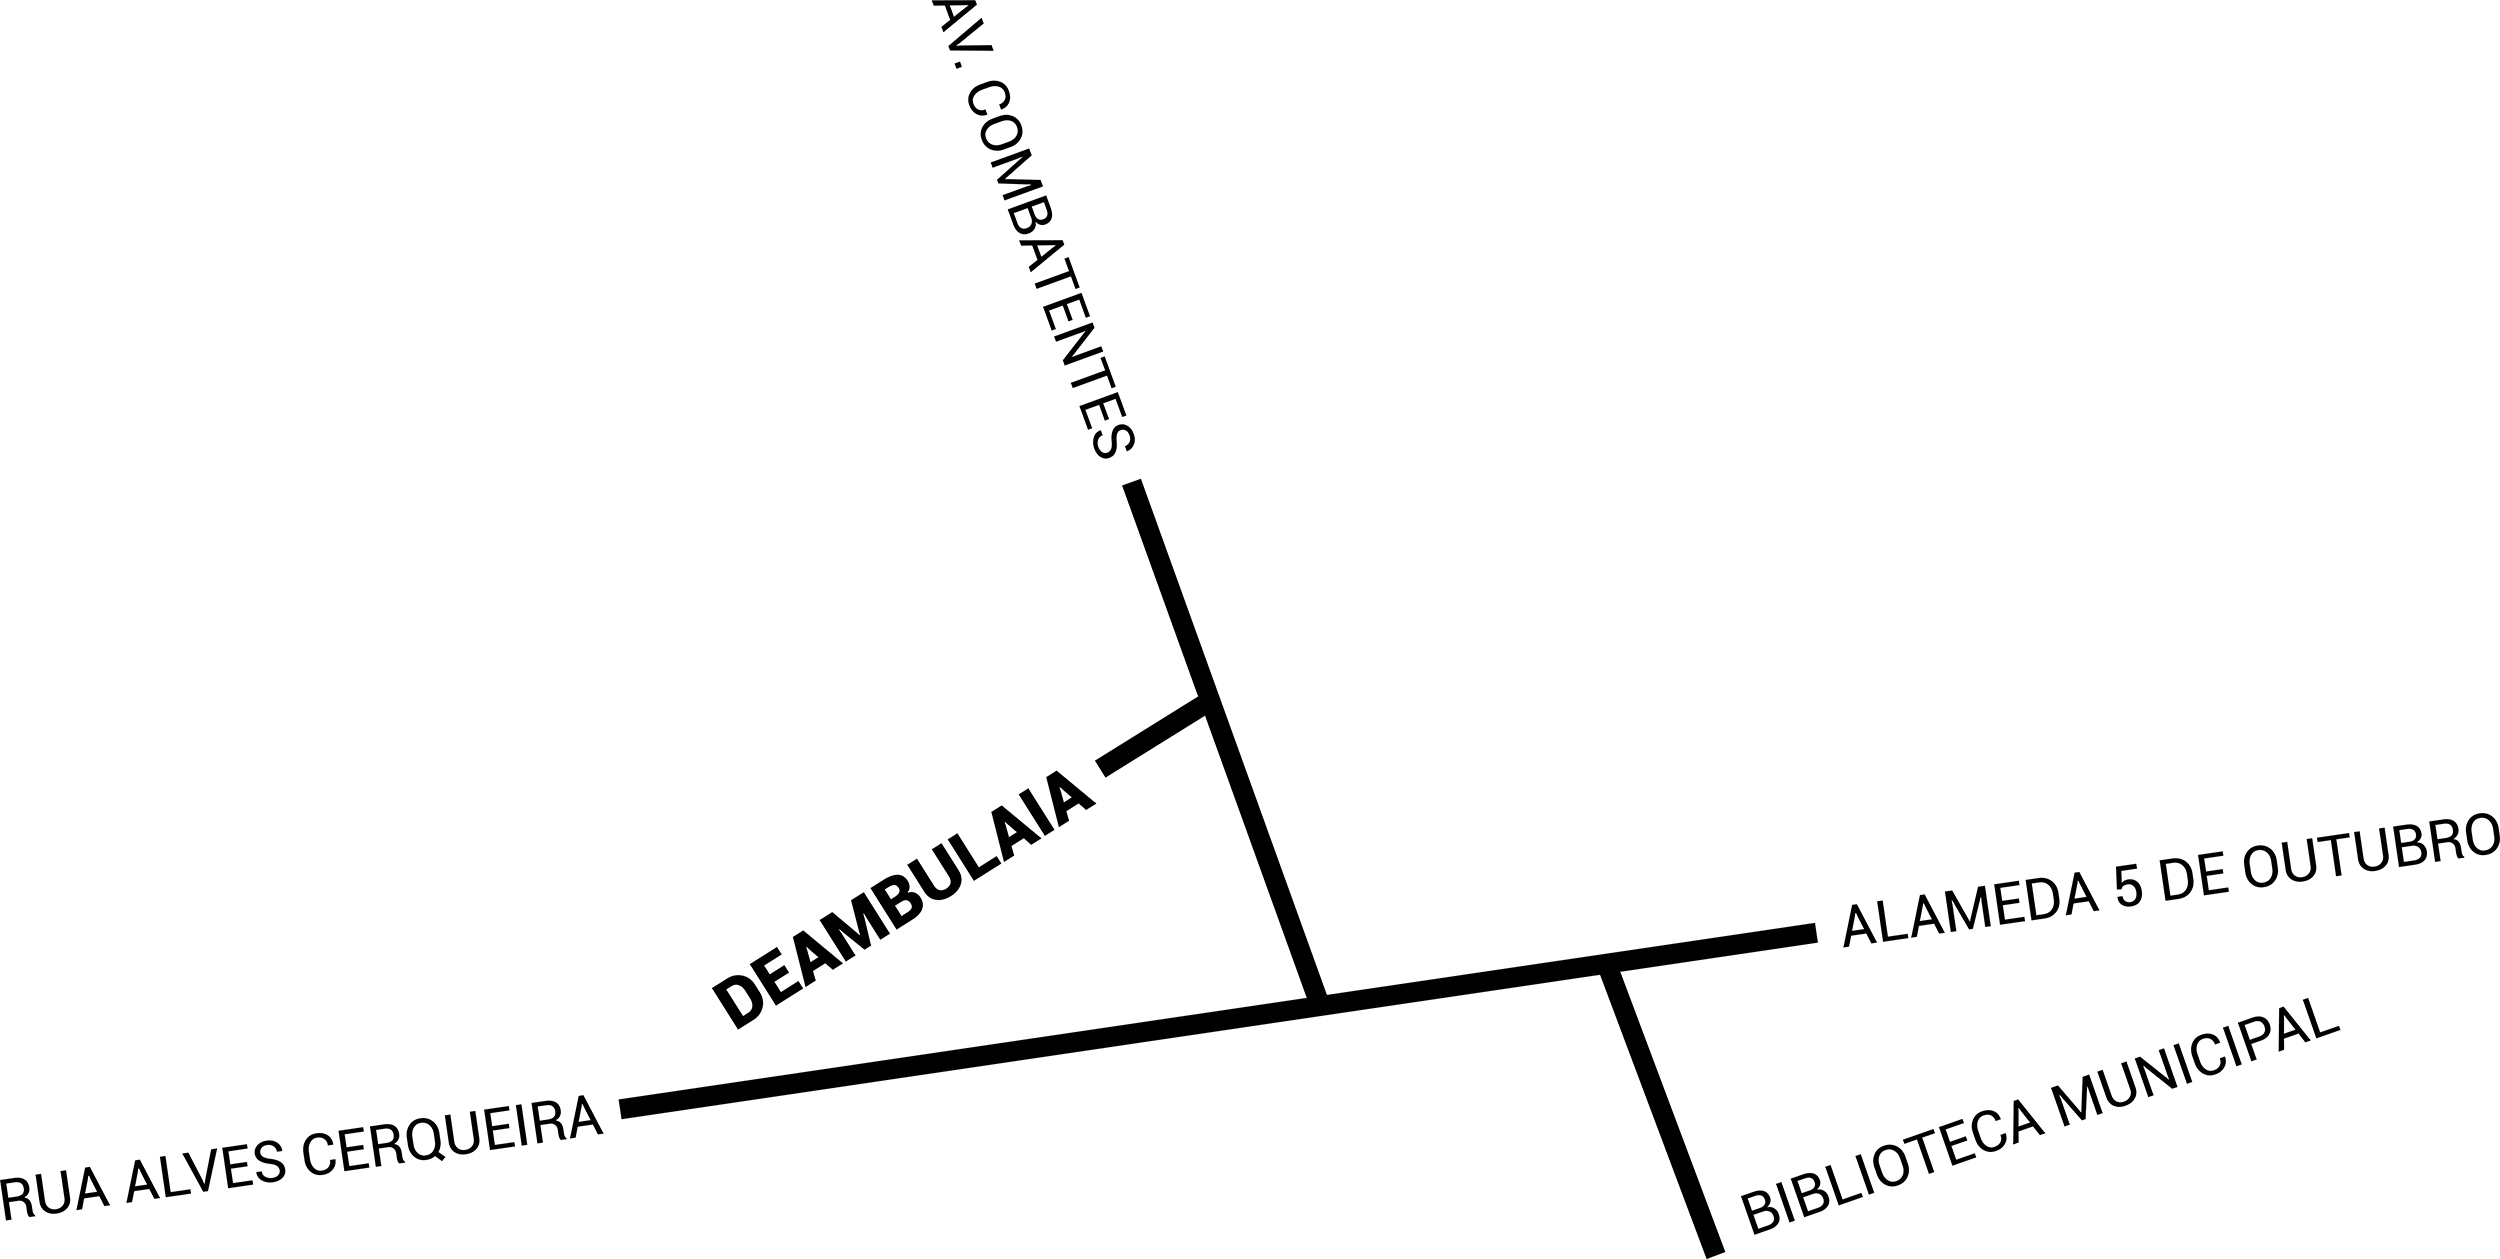 Mapa Exposicao Viana do Castelo.jpg